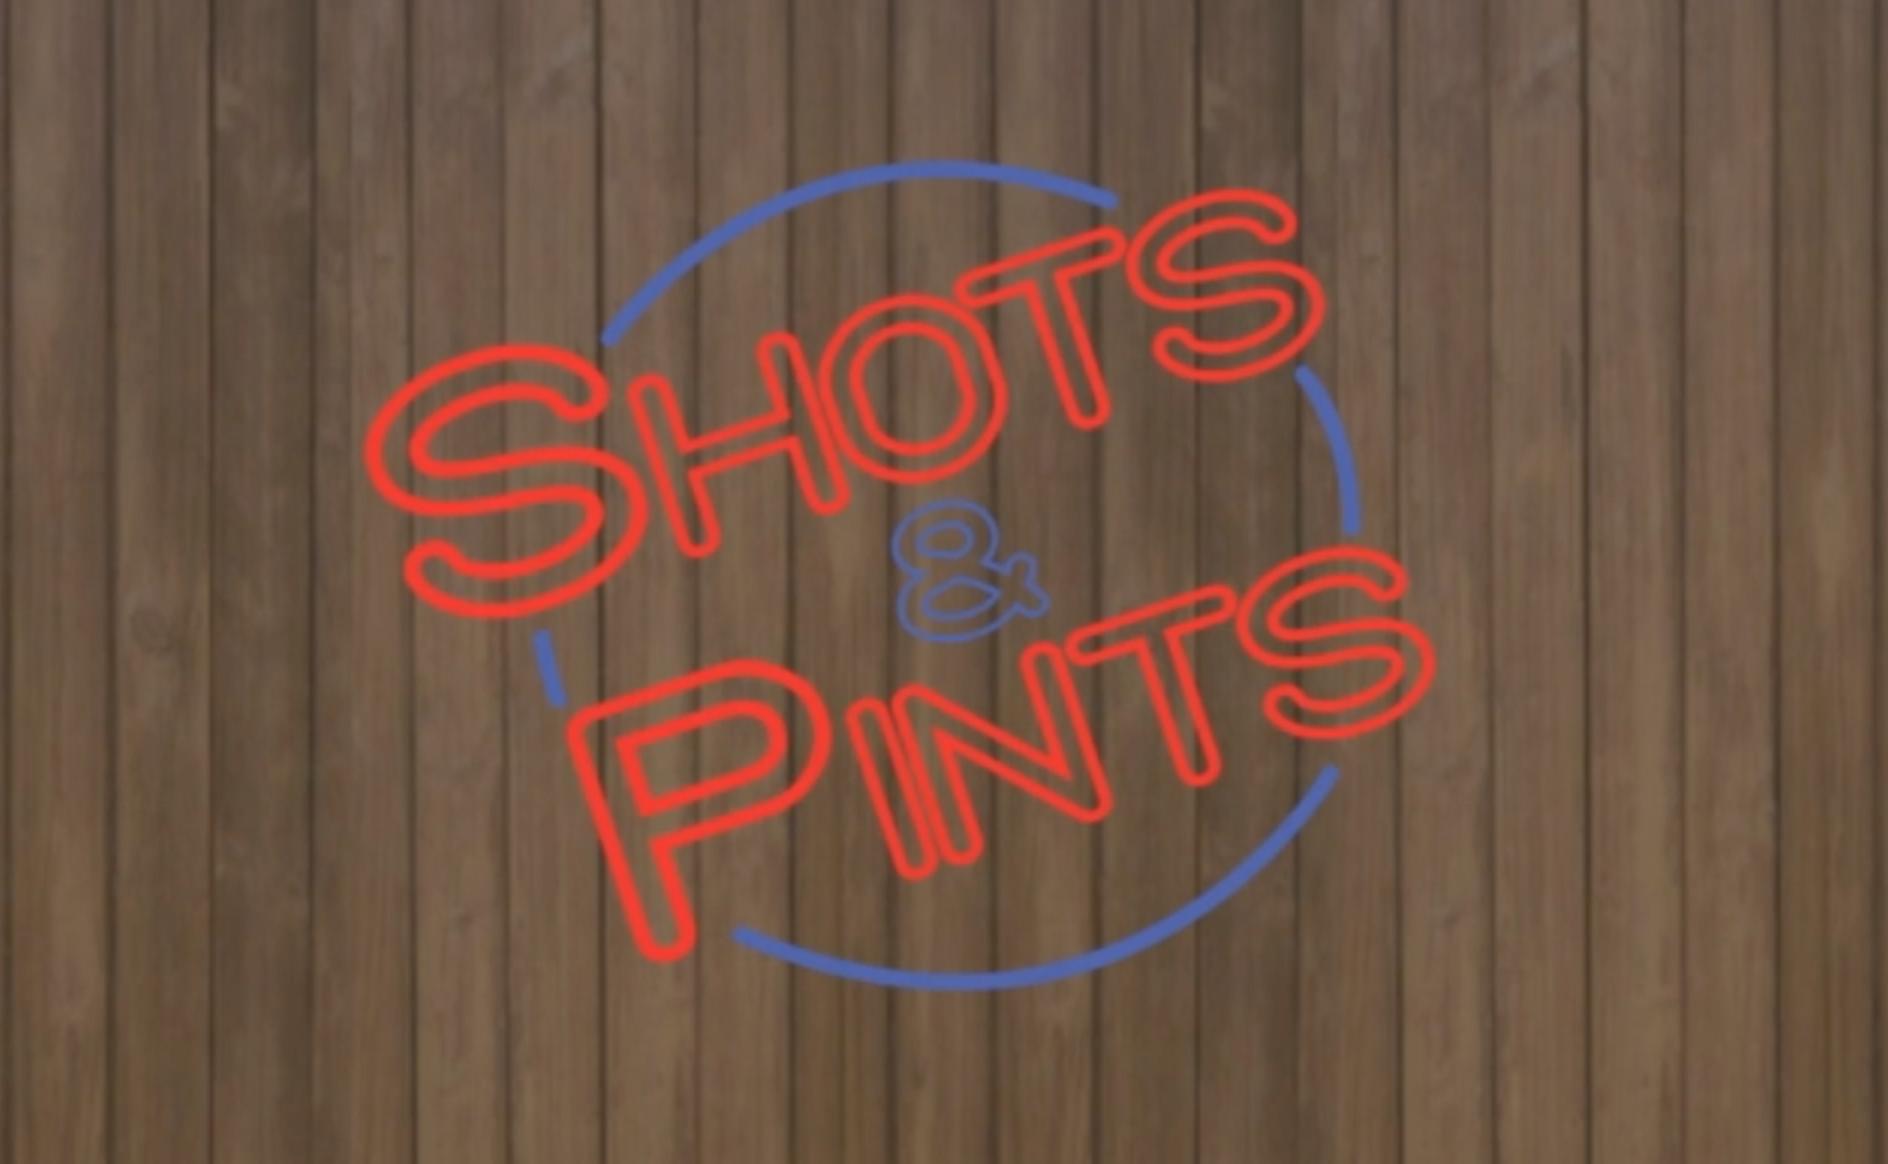 Shots & Pints